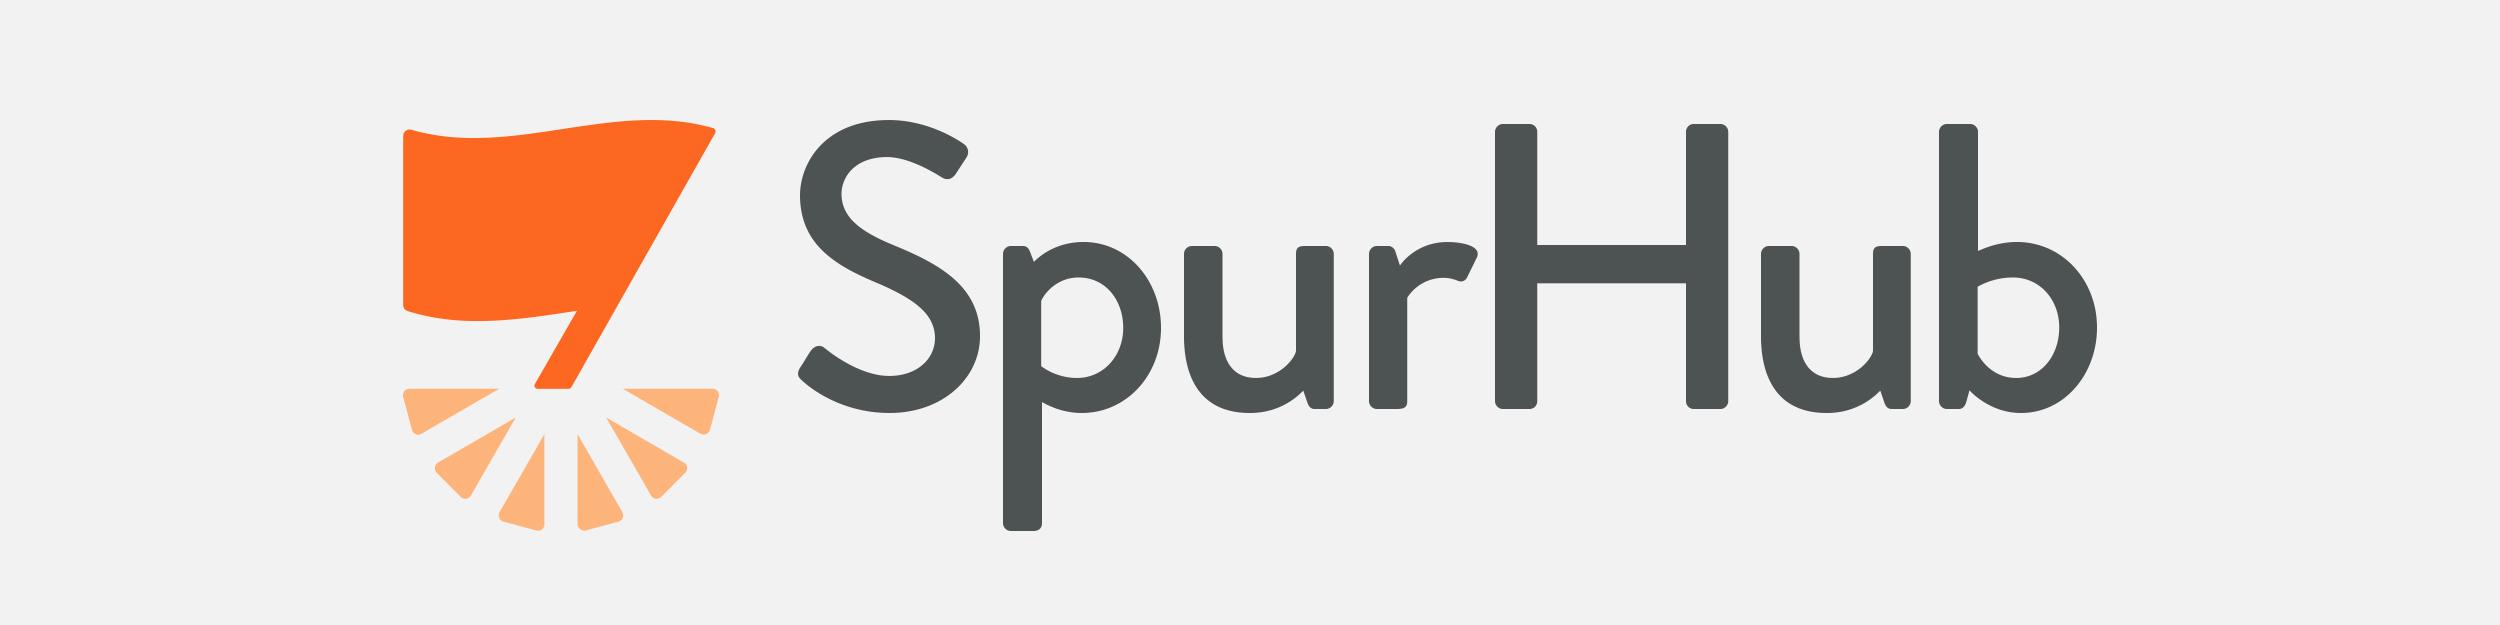 Spurhub-logo-feature.jpg